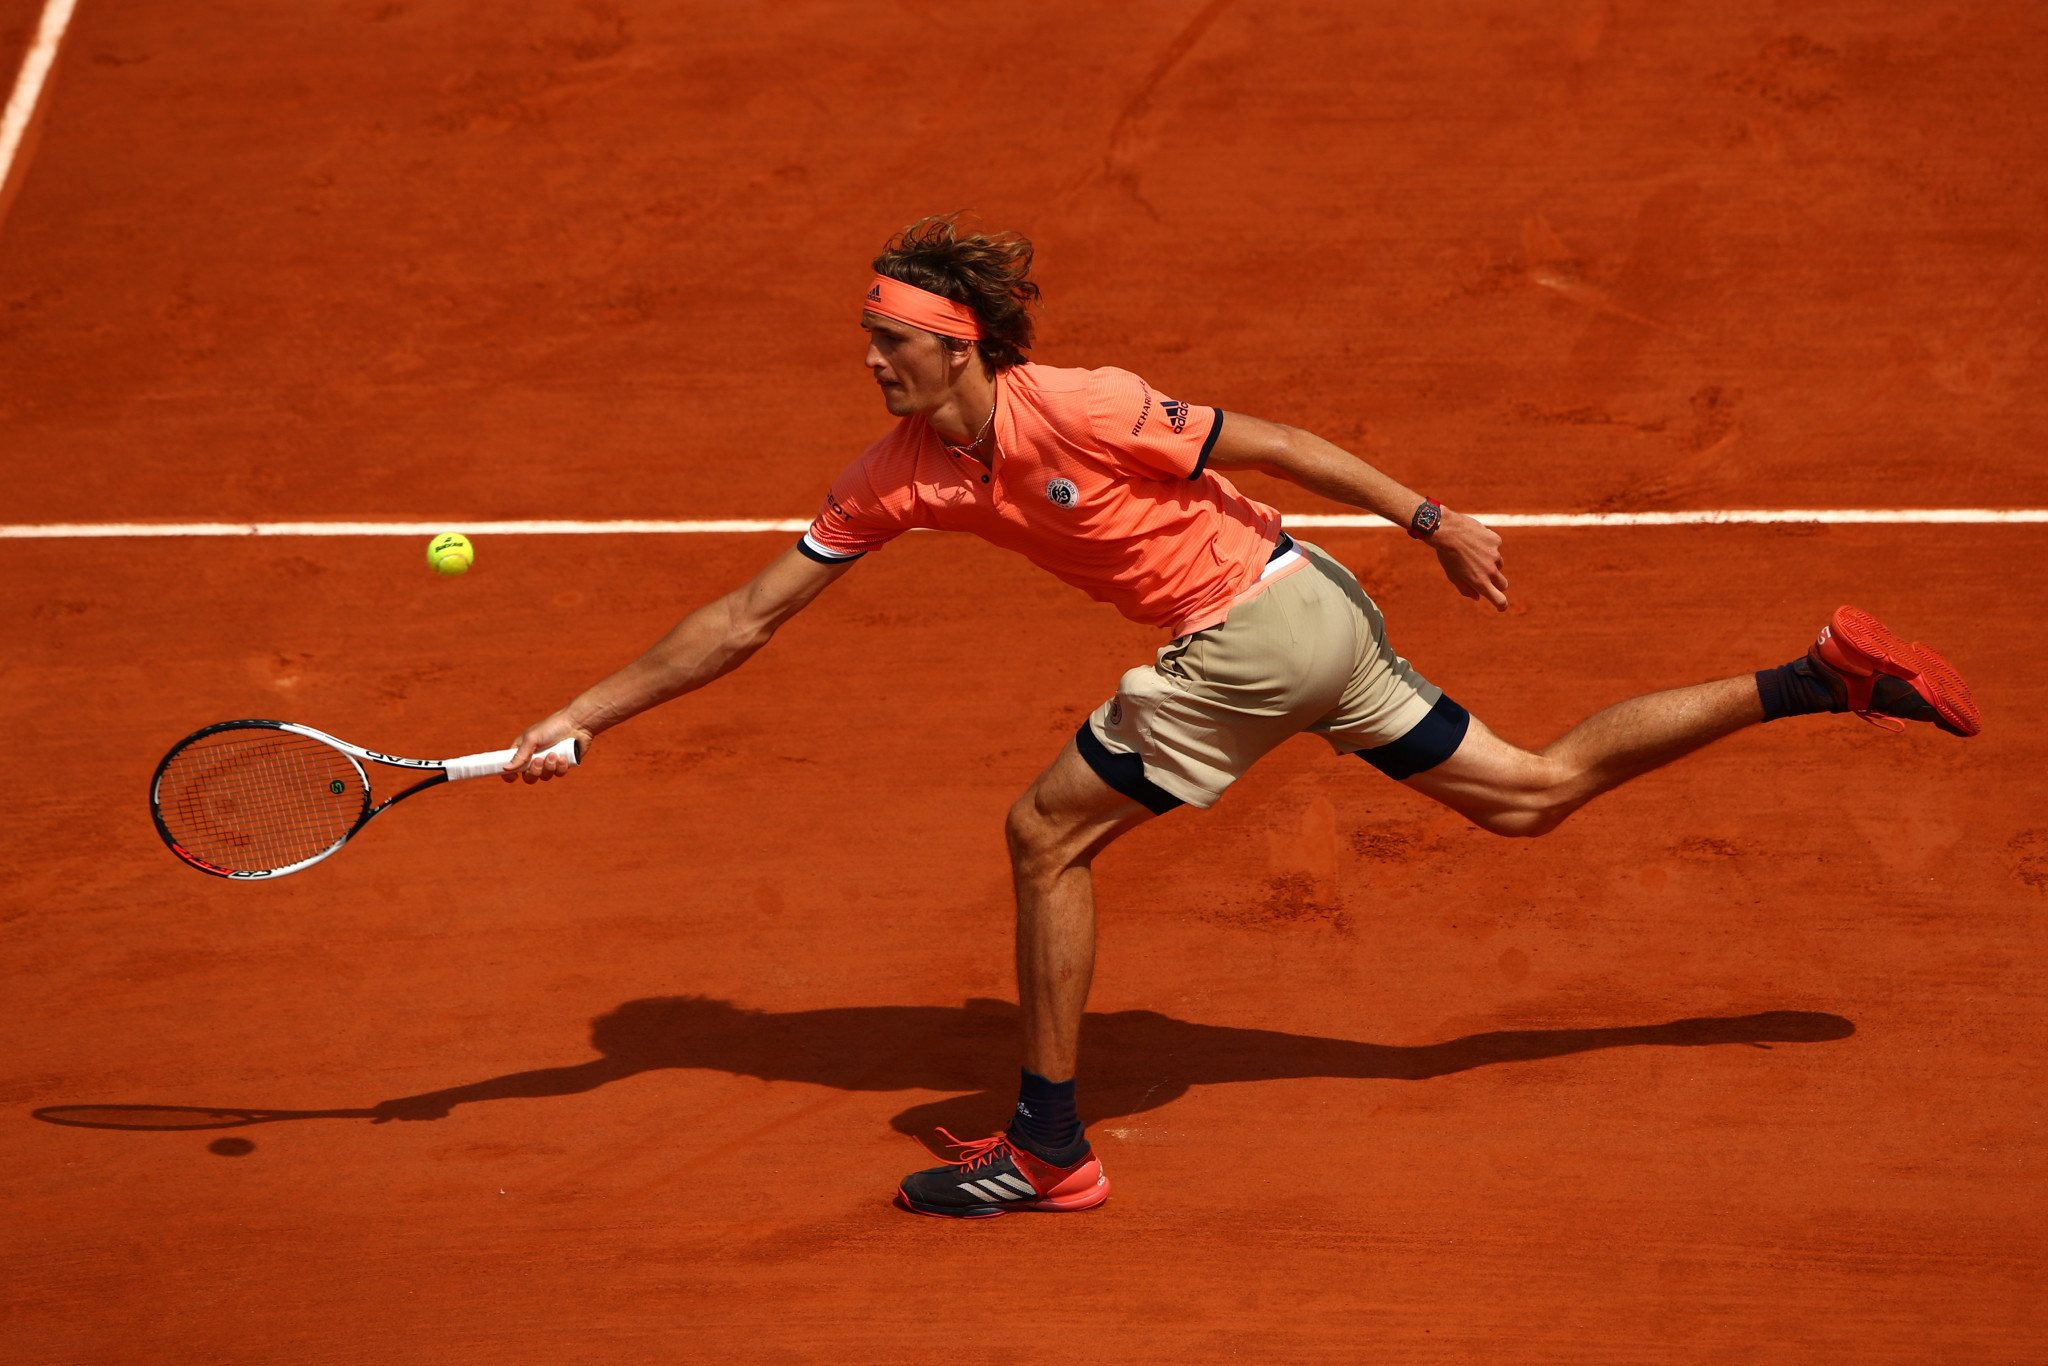 Zverev survives scare to reach French Open quarter-final